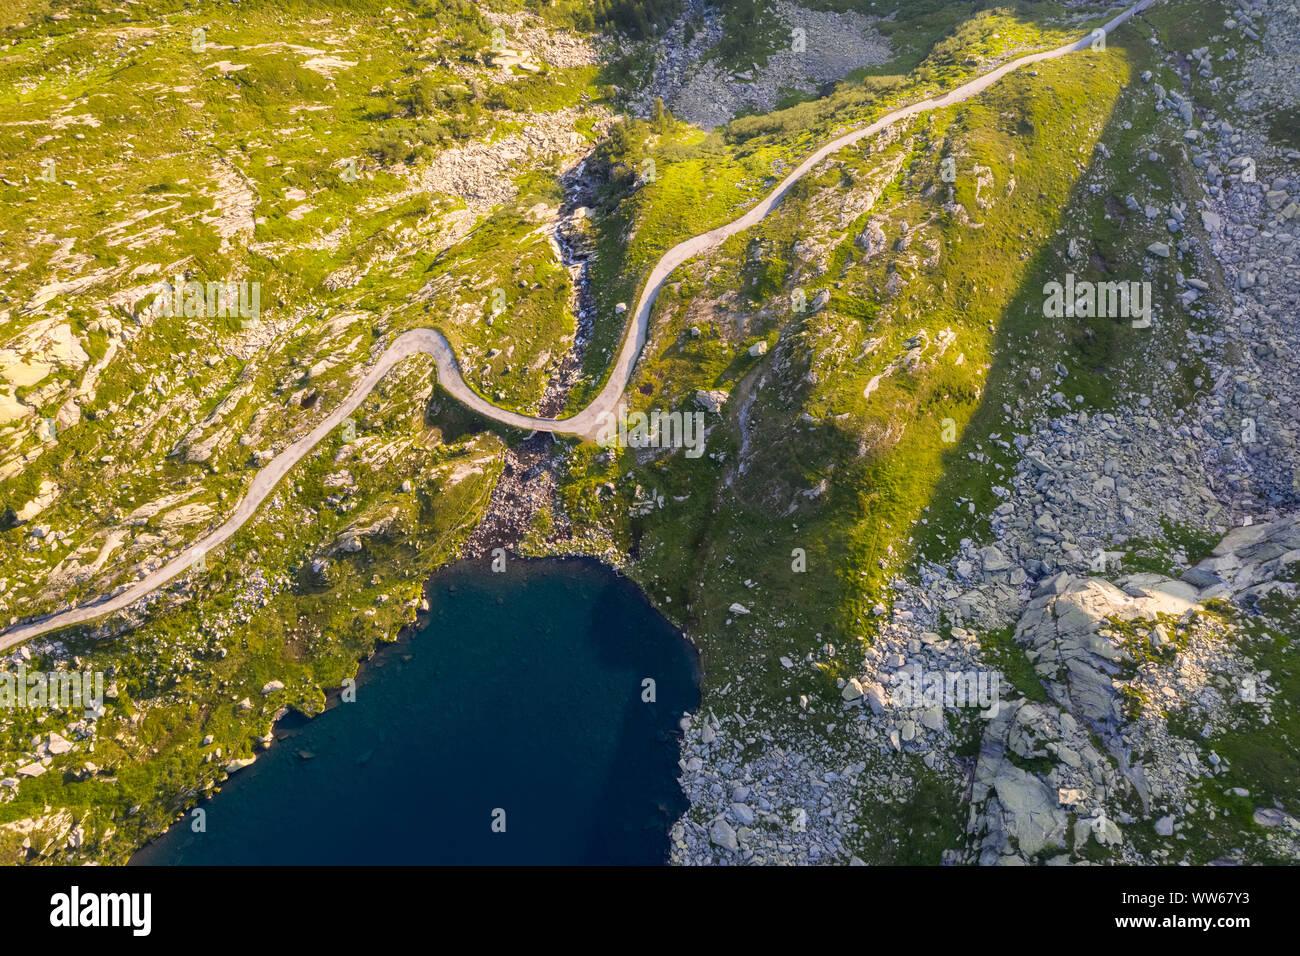 Vista aérea del lago Superiore en Valle Lavizzara al amanecer, Valle de Maggia, Alpes Lepontine, Canton Ticino, Suiza. Foto de stock